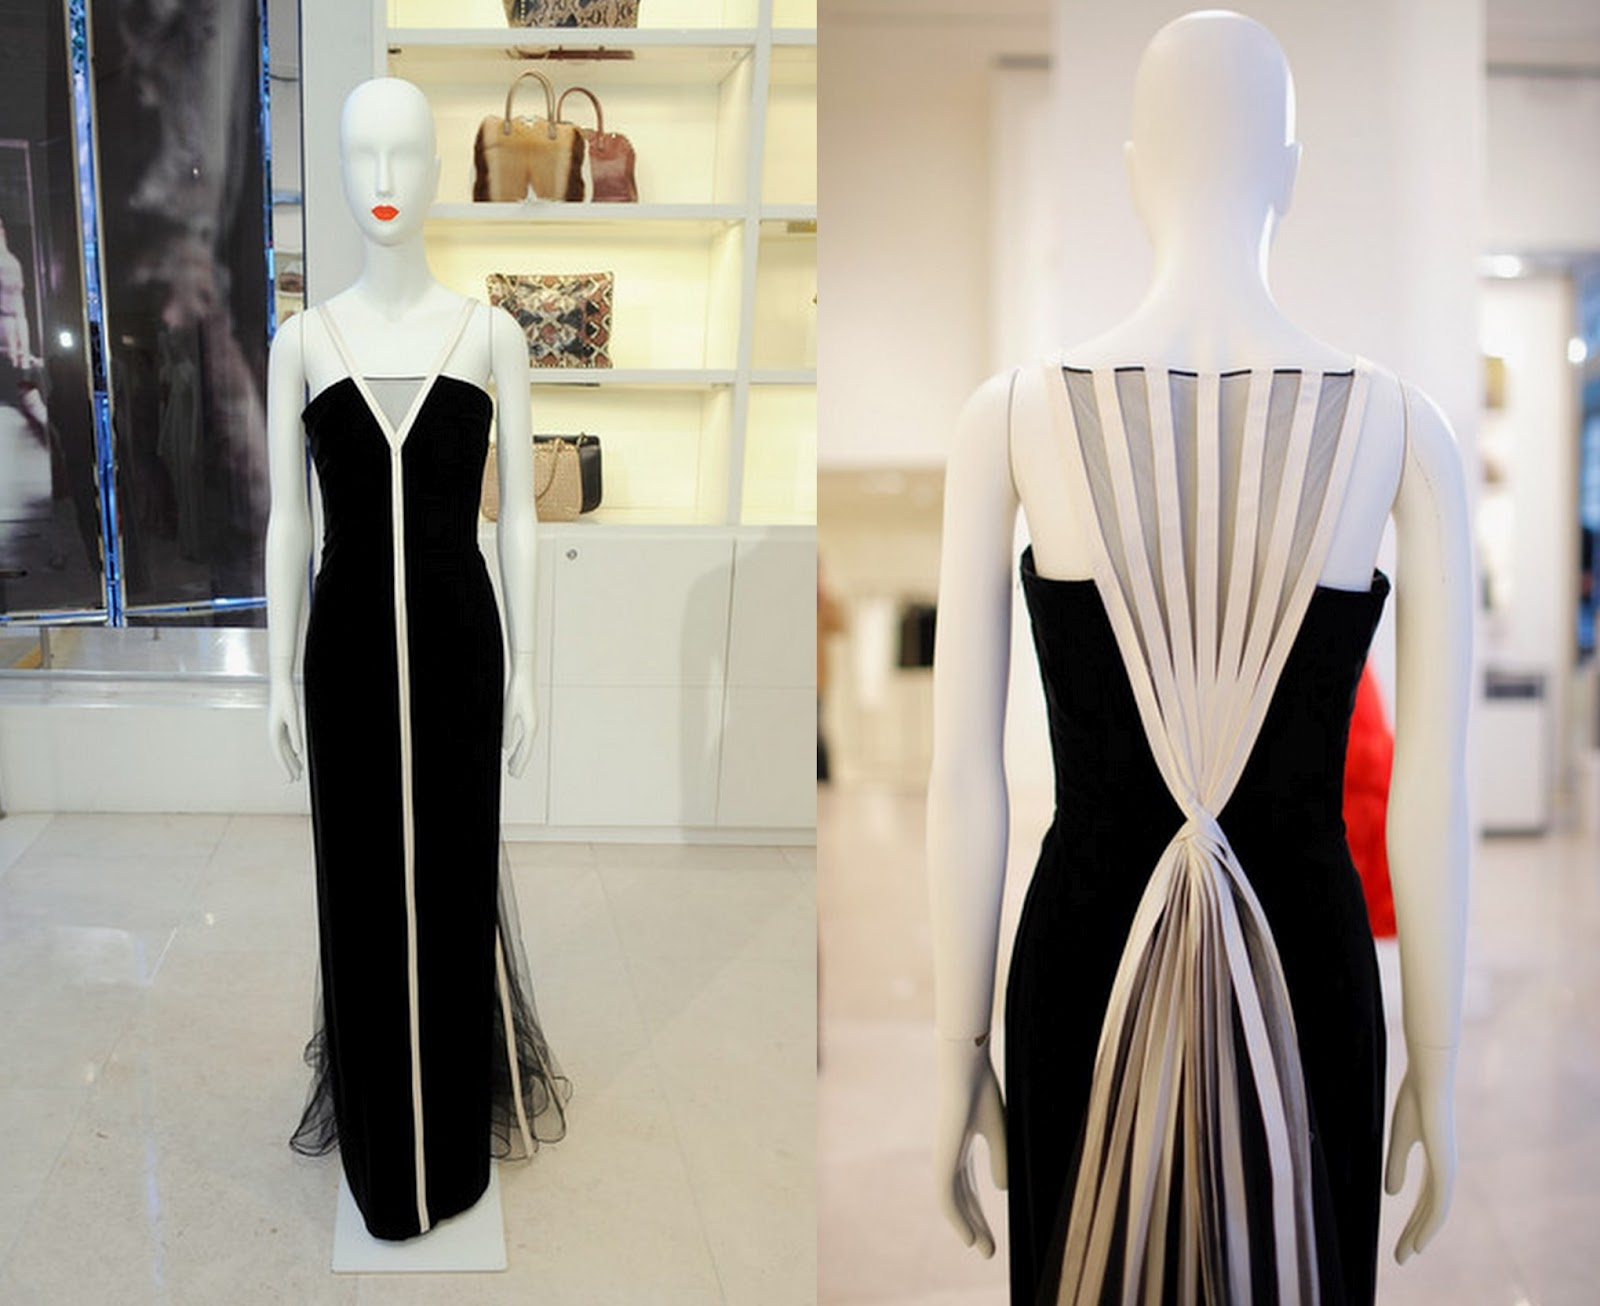 http://1.bp.blogspot.com/-tqp7PJw0sCc/T0TflPgorNI/AAAAAAAADVY/qLxDXkwfoPE/s1600/dresses.jpg